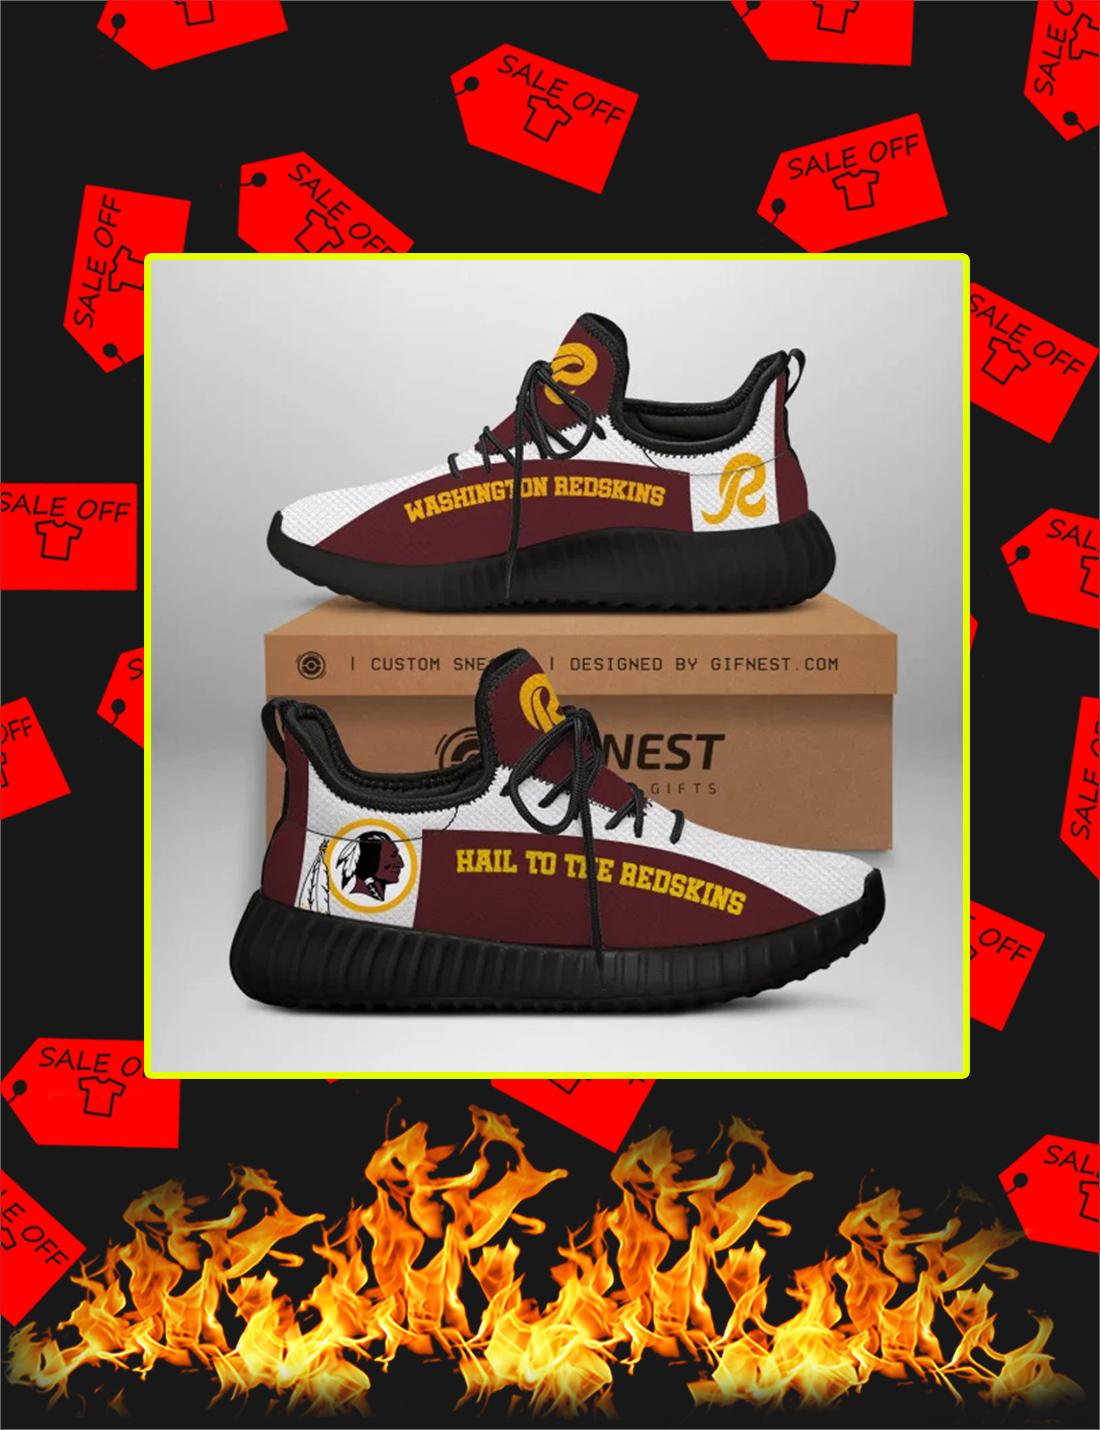 Washington Redskins NFL Yeezy Sneaker - Picture 1